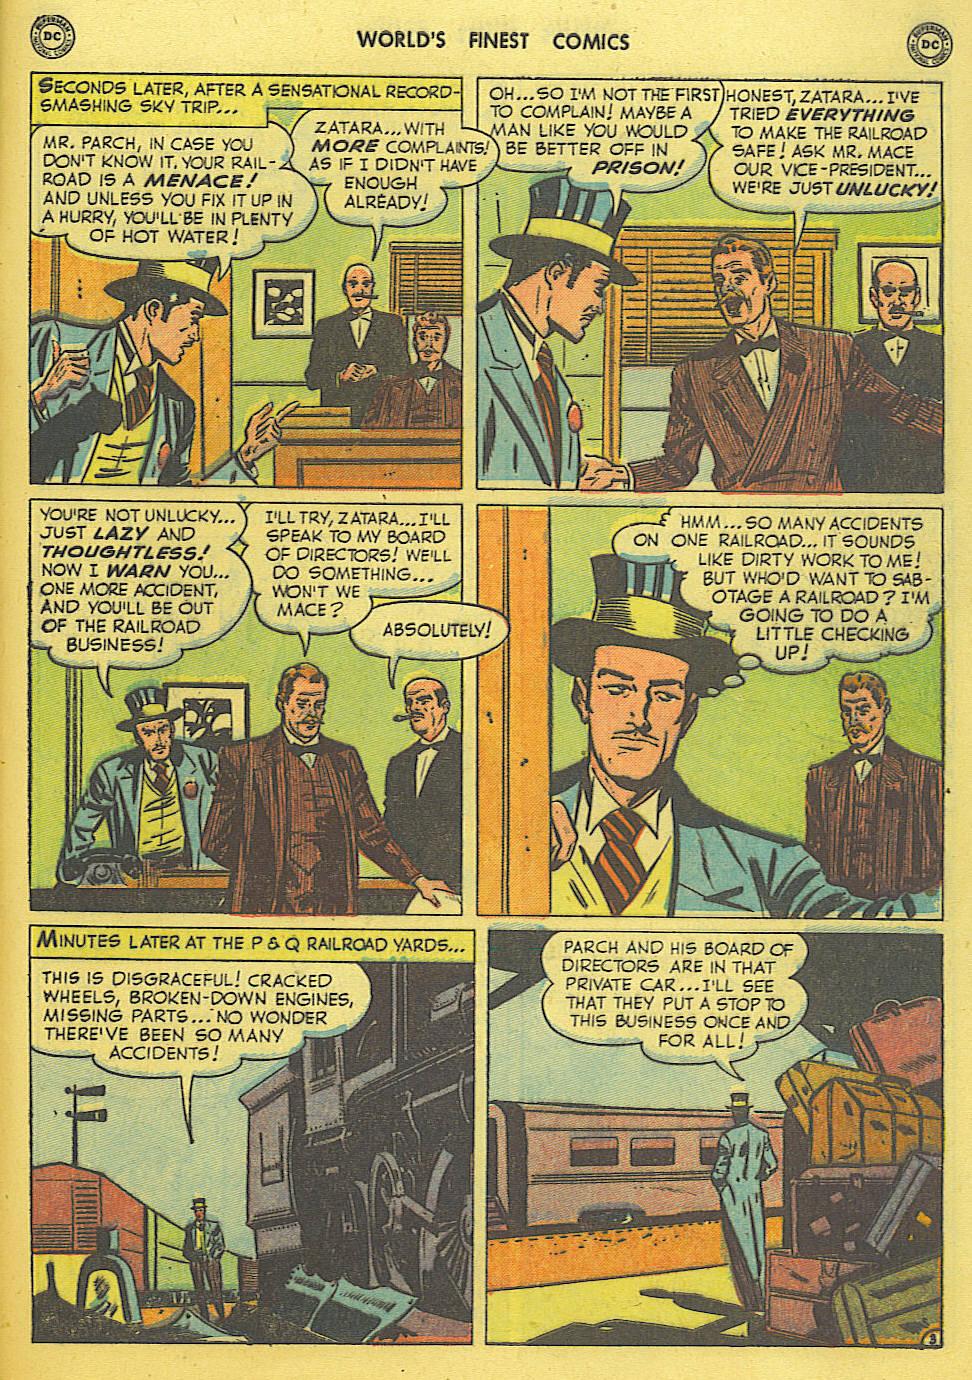 Read online World's Finest Comics comic -  Issue #49 - 54